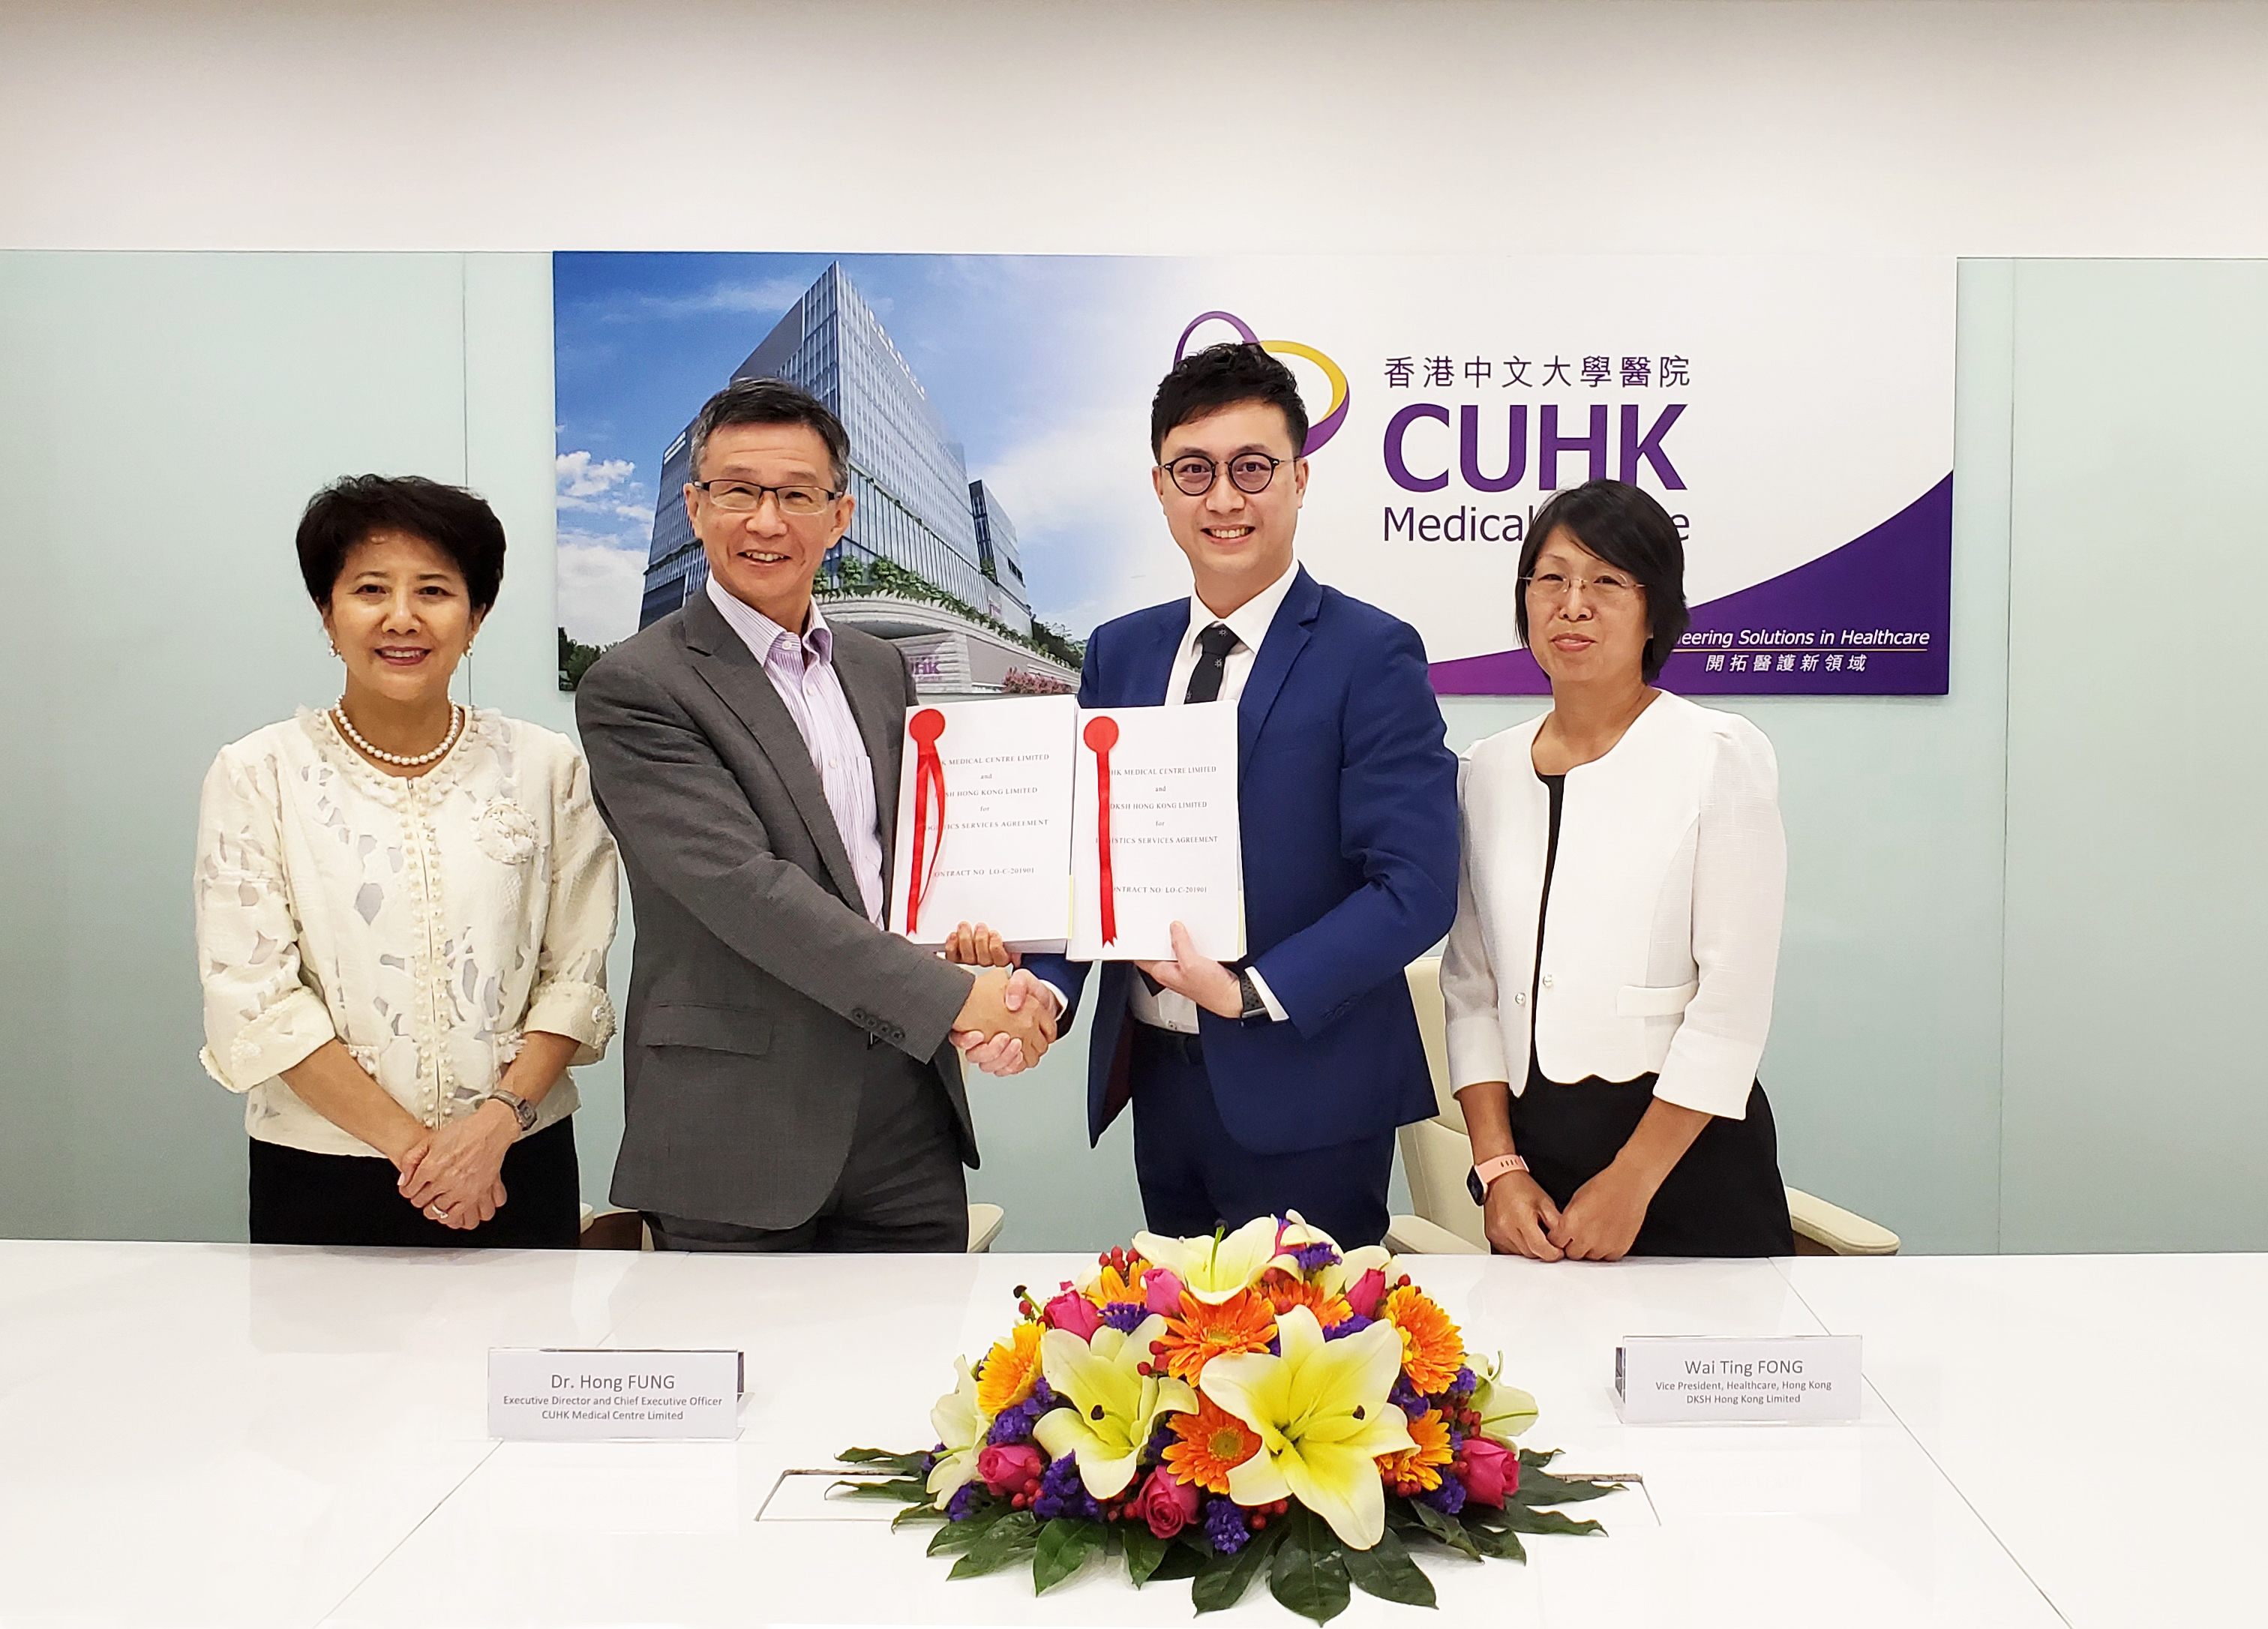 DKSH partners with CUHK Medical Centre to provide unprecedented medical logistics model in Hong Kong